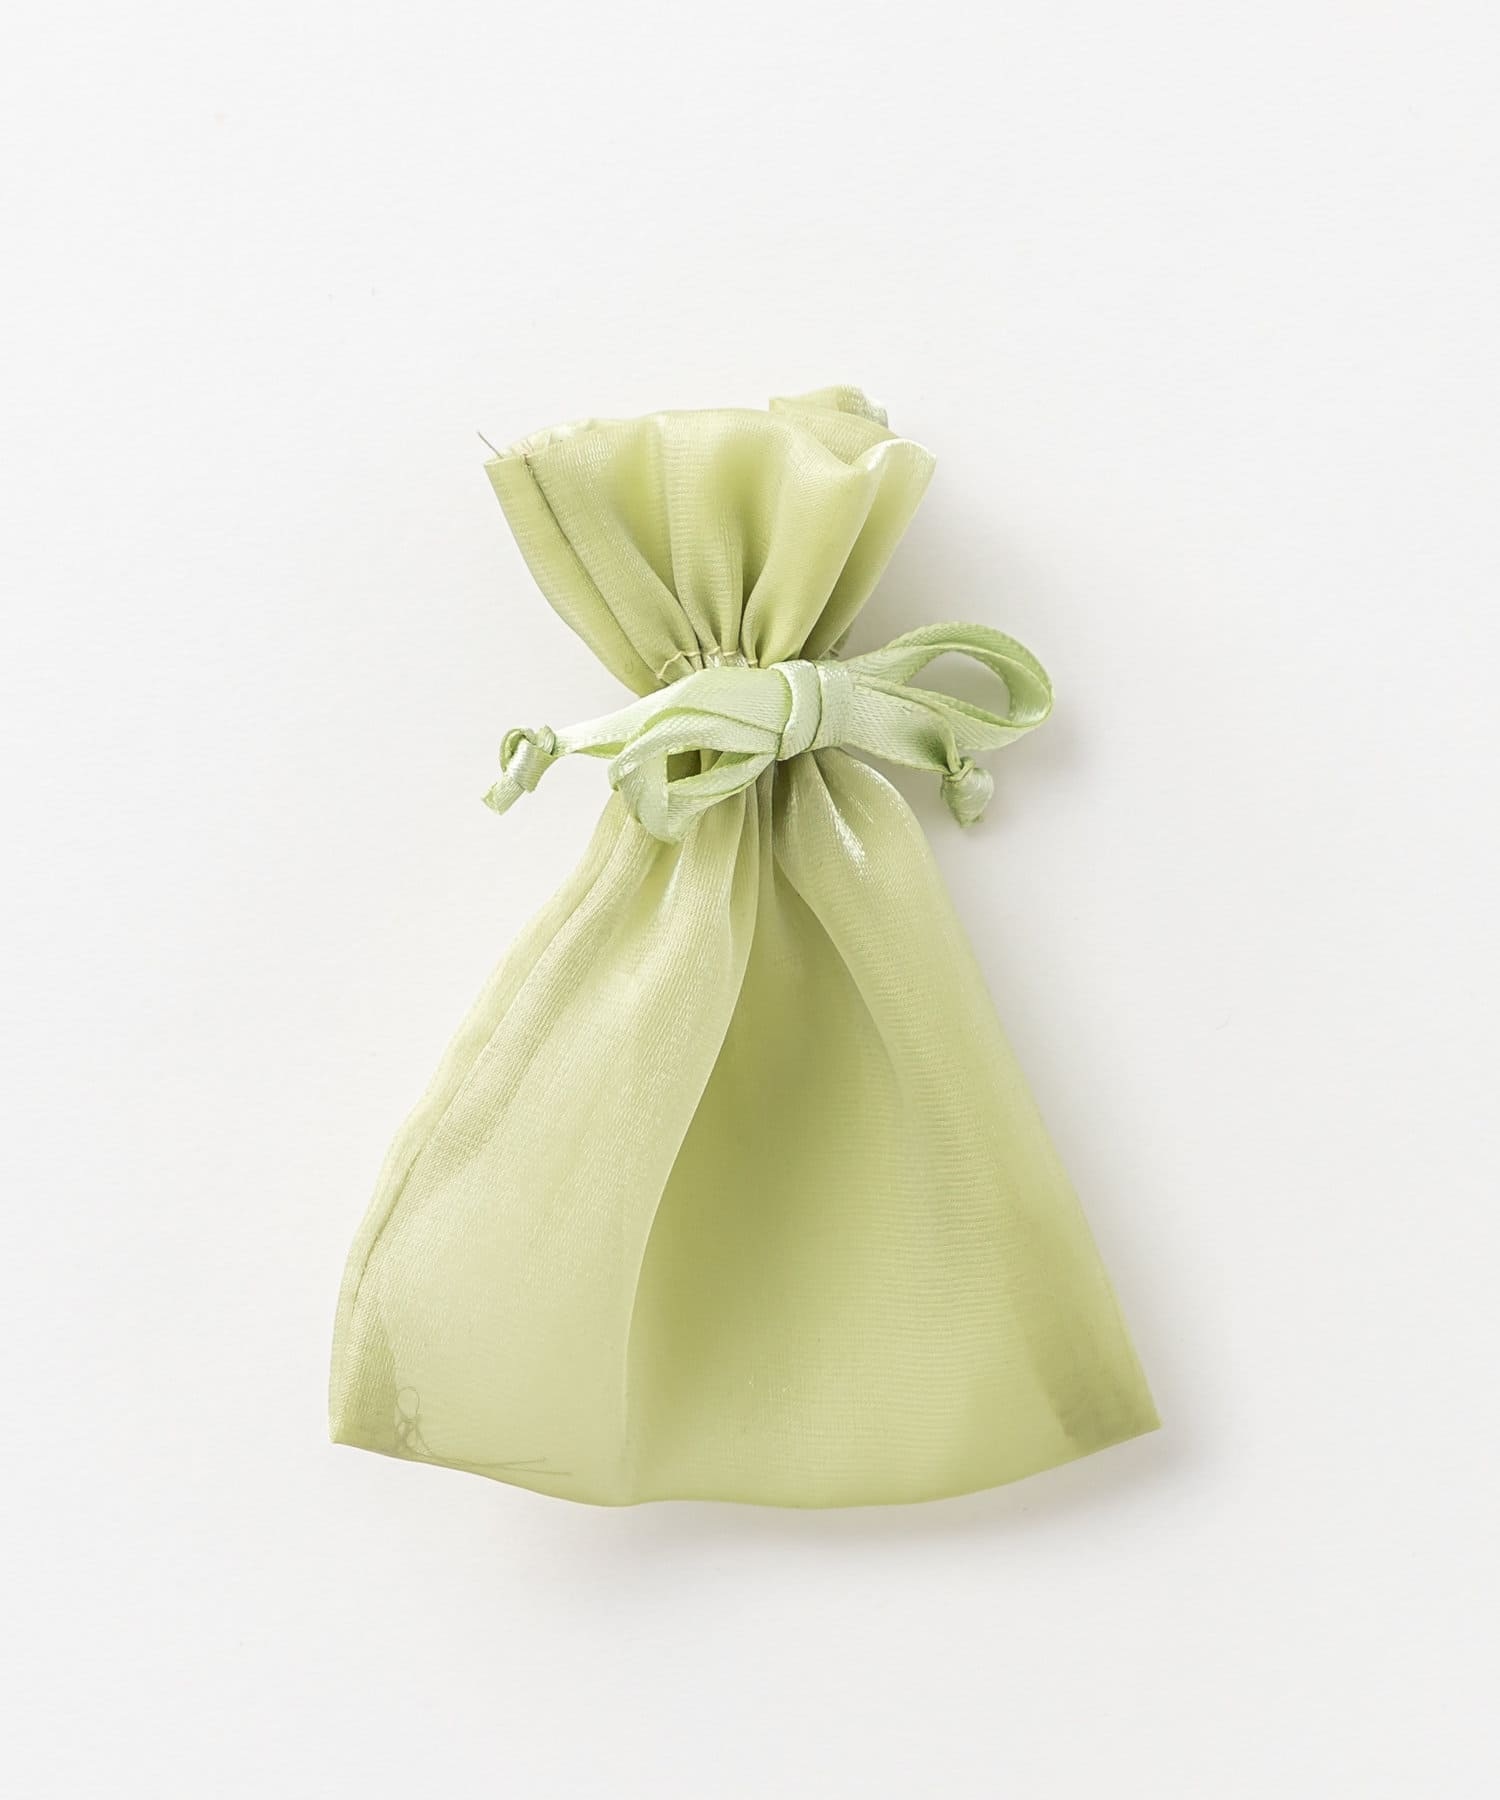 Lattice(ラティス) レディース シアー巾着ポーチS ライトグリーン